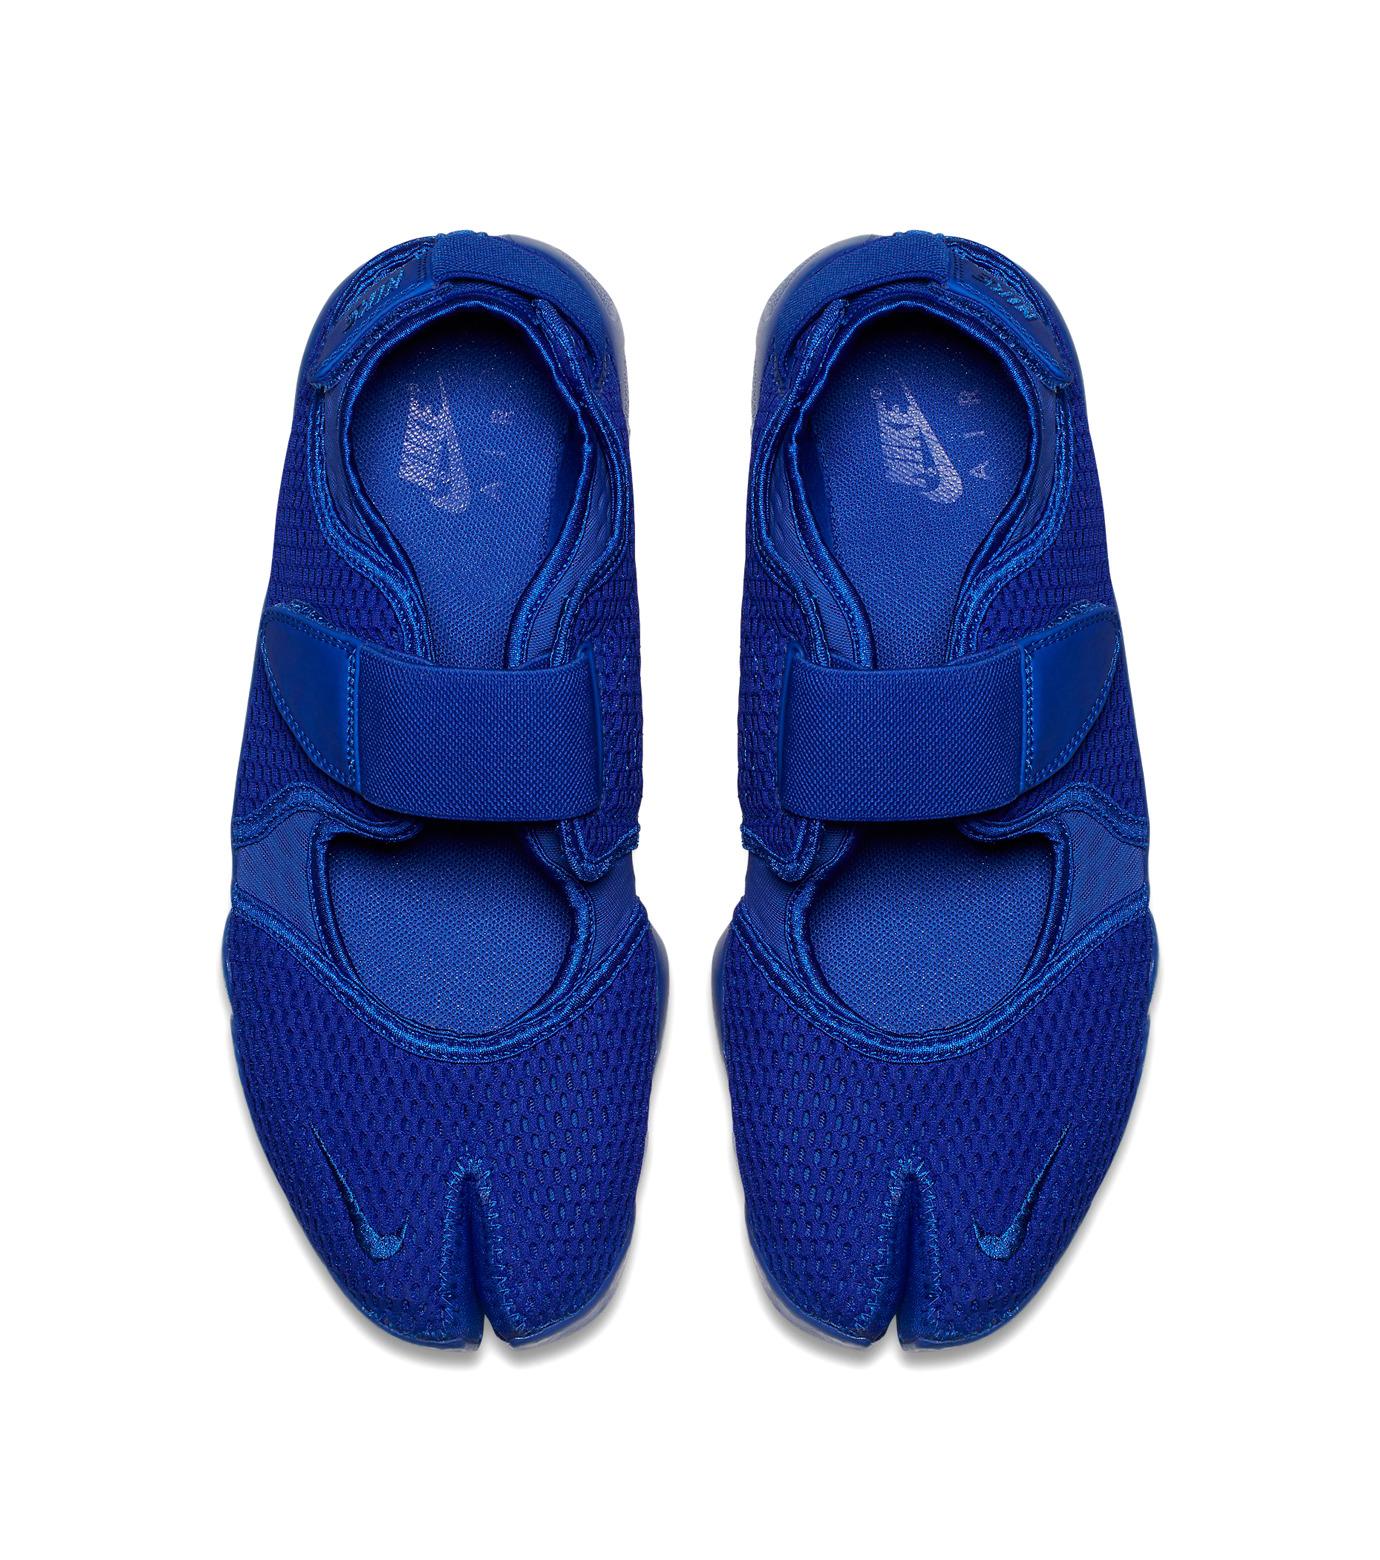 NIKE(ナイキ)のAir Rift Breathe-BLUE(シューズ/shoes)-847609-400-92 拡大詳細画像5